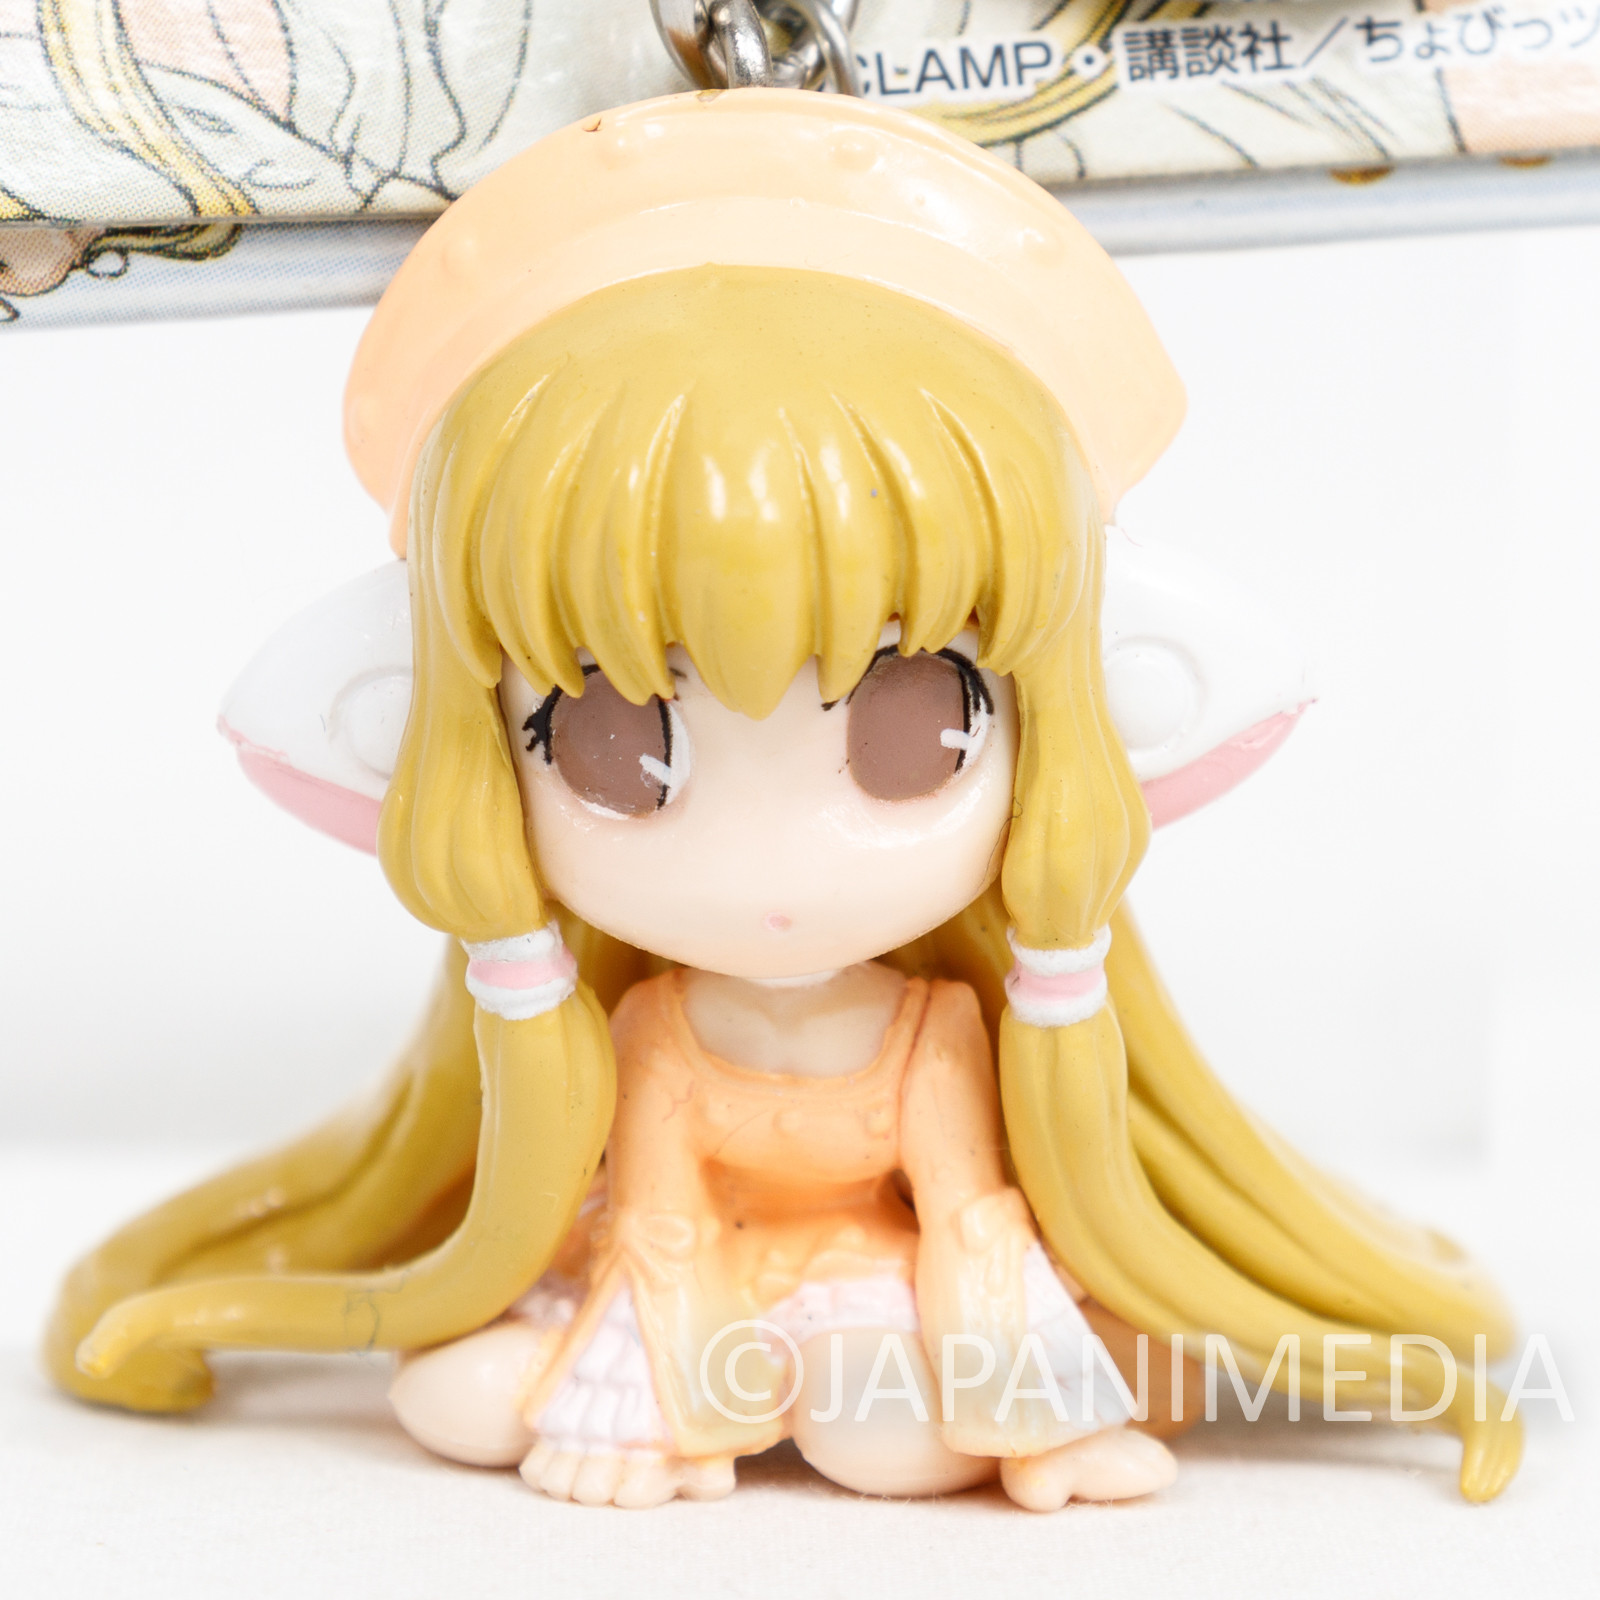 Chobits Elda Chii Figure Keychain CLAMP JAPAN ANIME MANGA